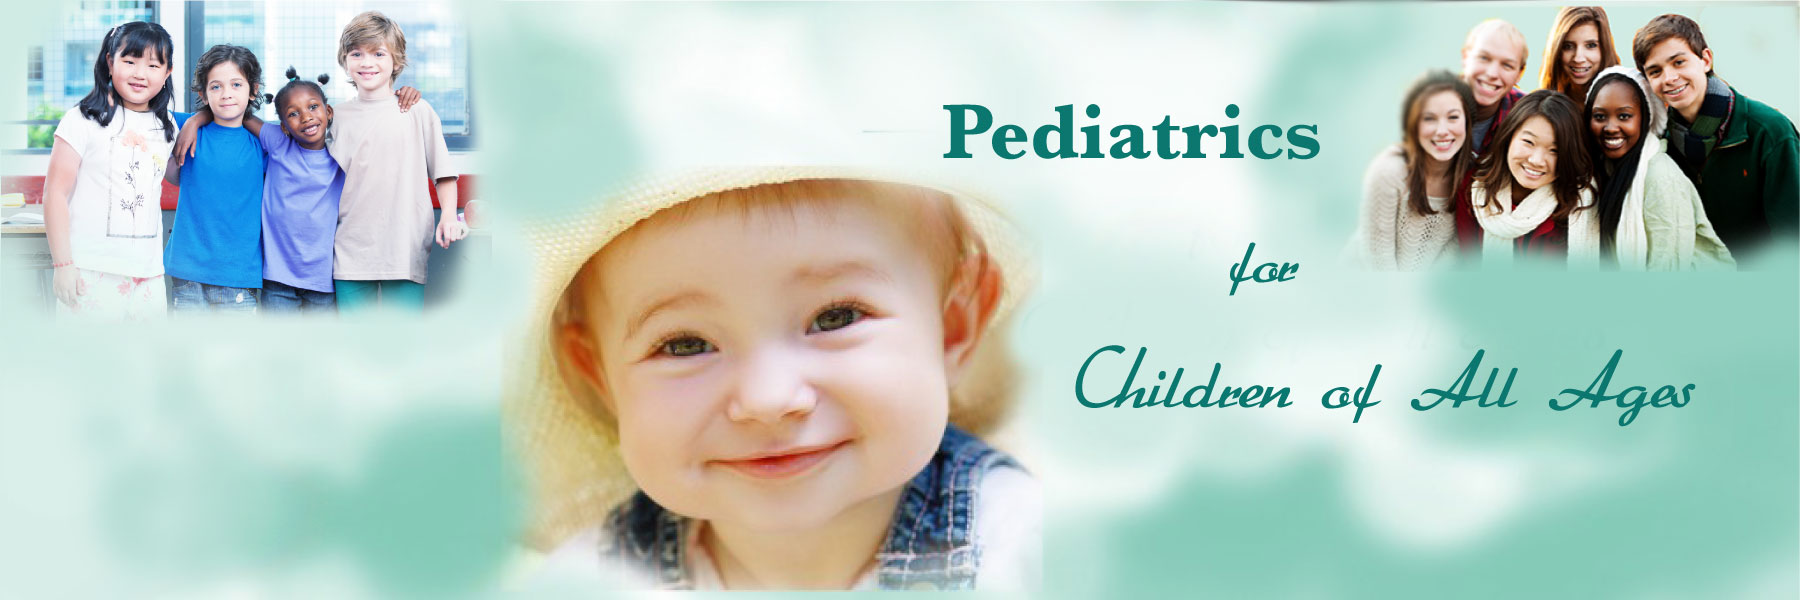 Pediatrics for Children of All Ages